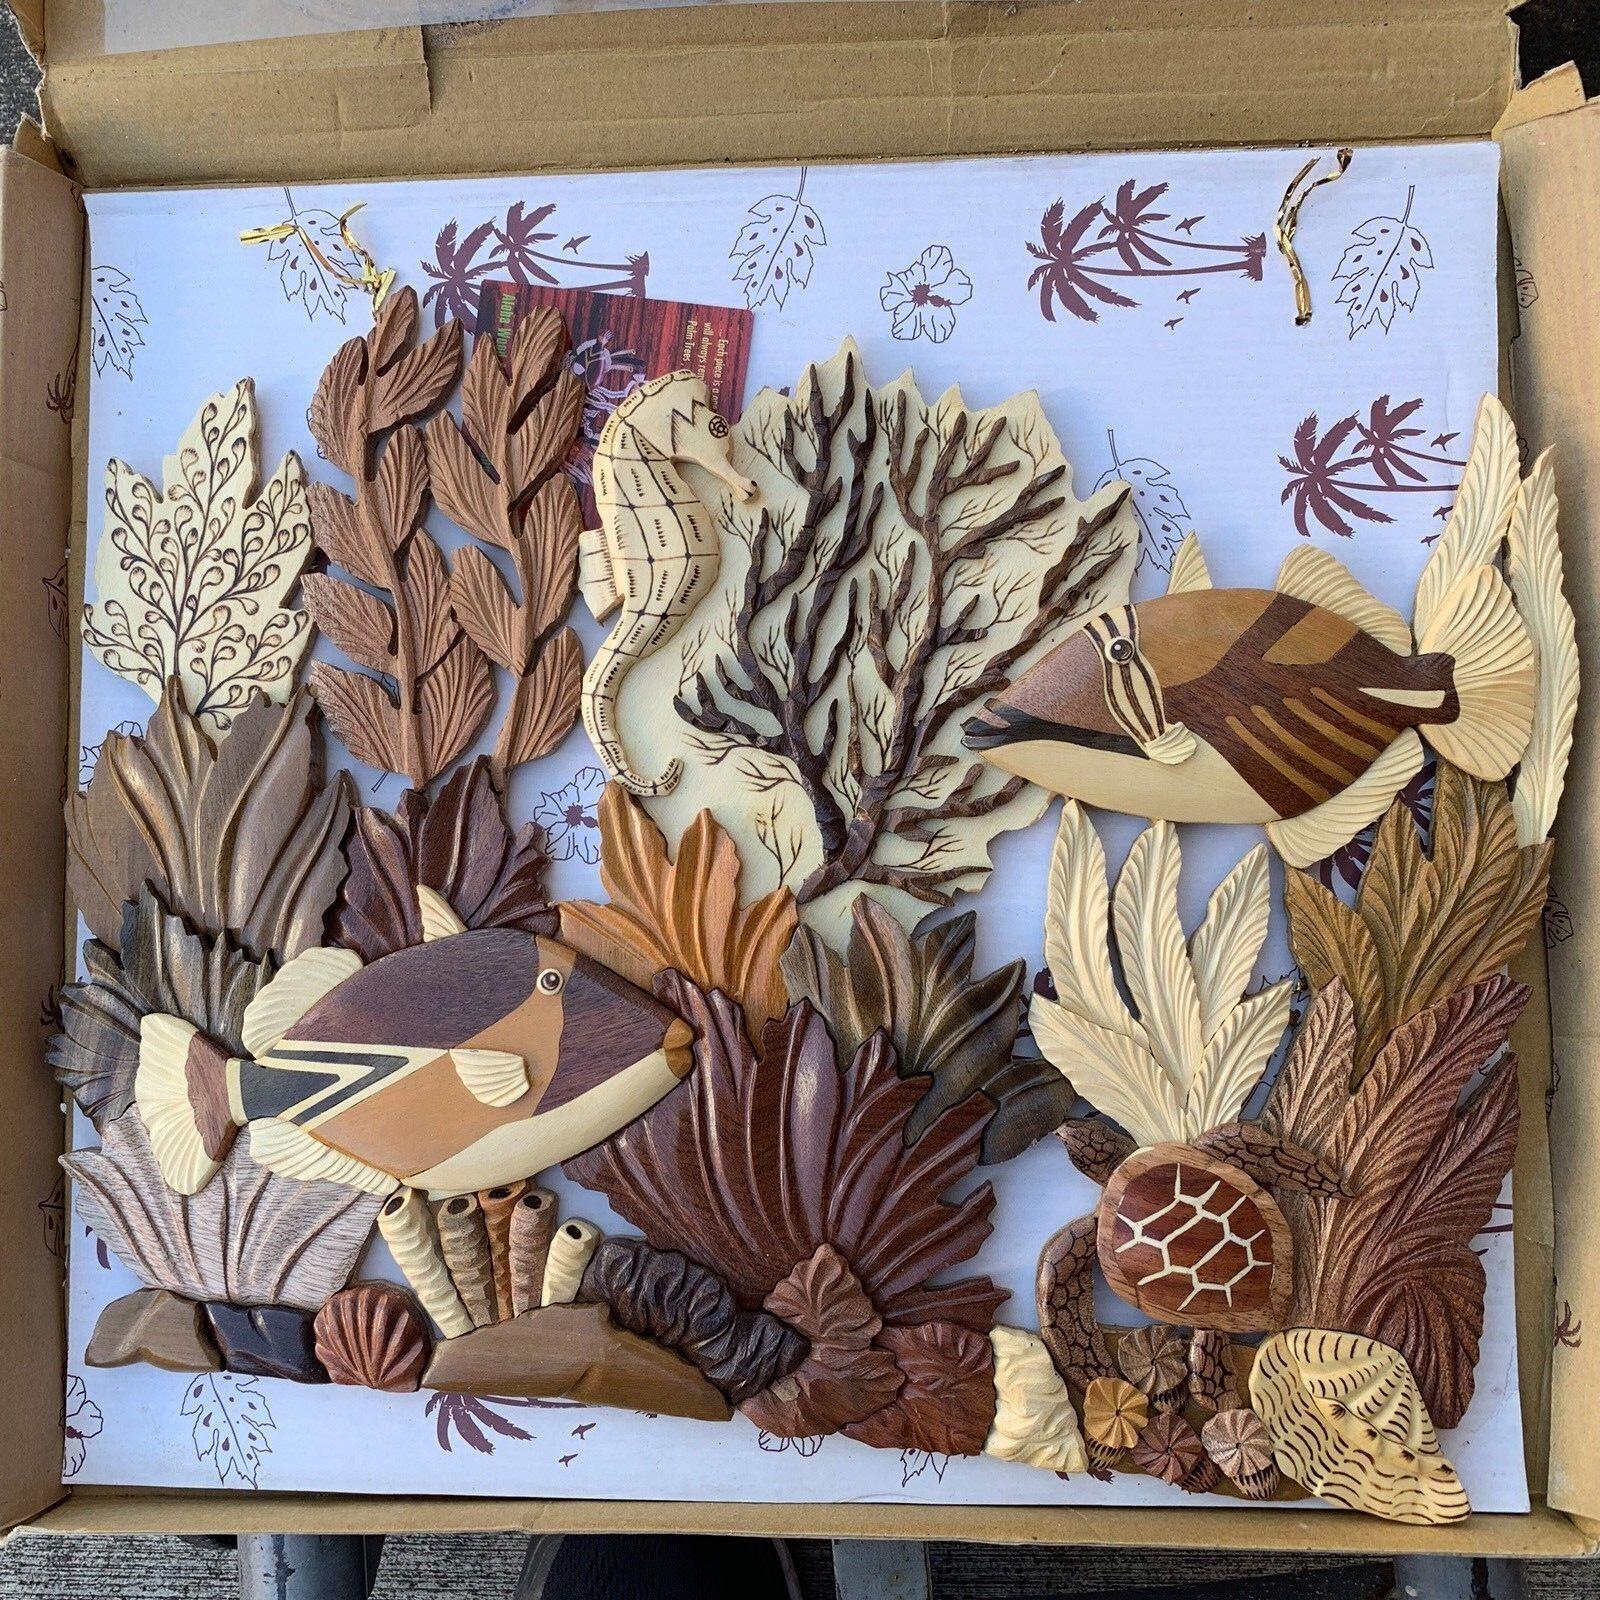 XL Hawaiana C1-coral Reef Tartaruga Humu Fatto a Mano Wood Arte da Parete Hawaii